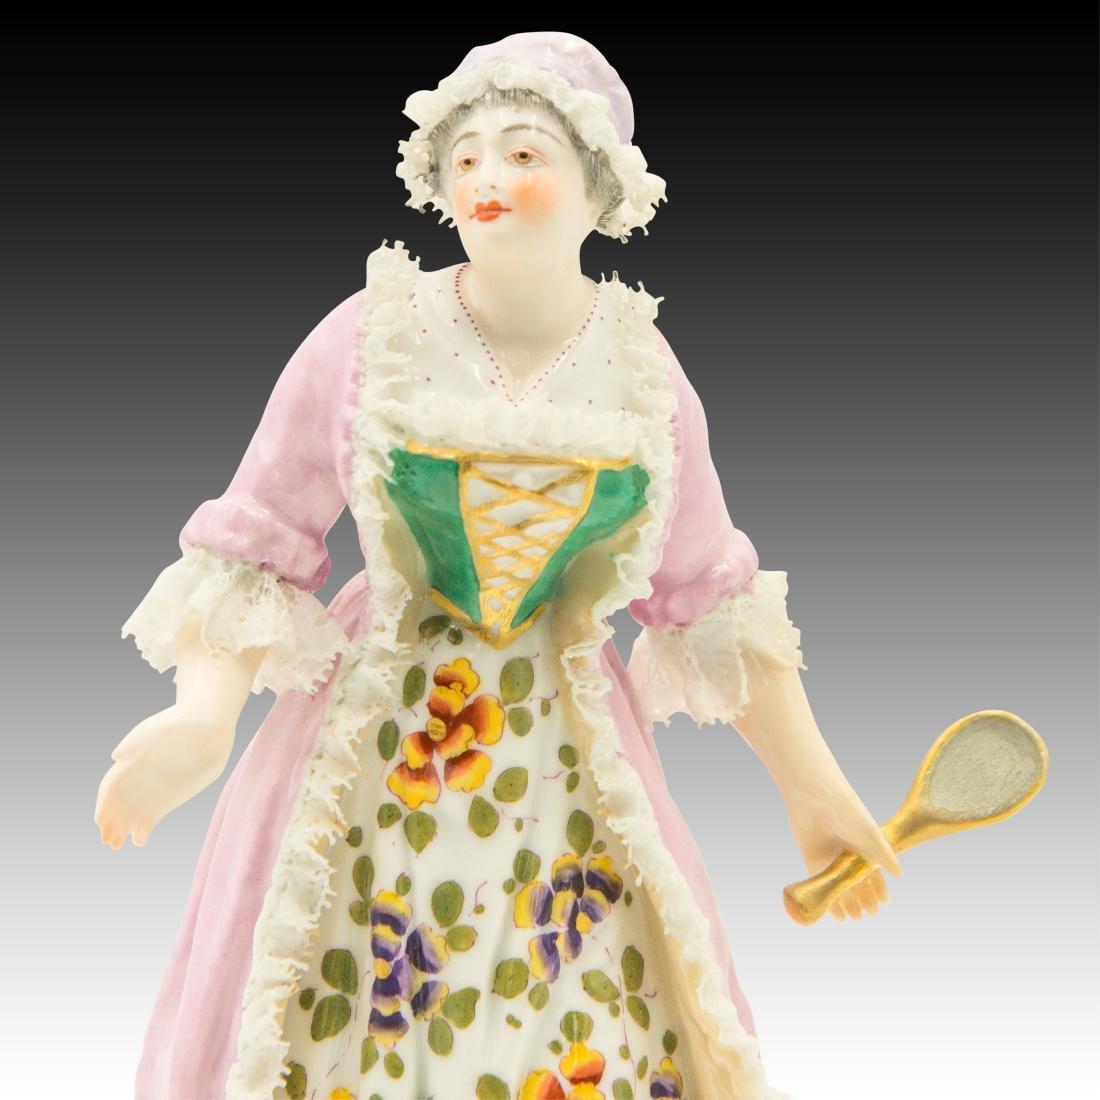 Meissen Maiden Wearing a Lace Dress Figurine - 5